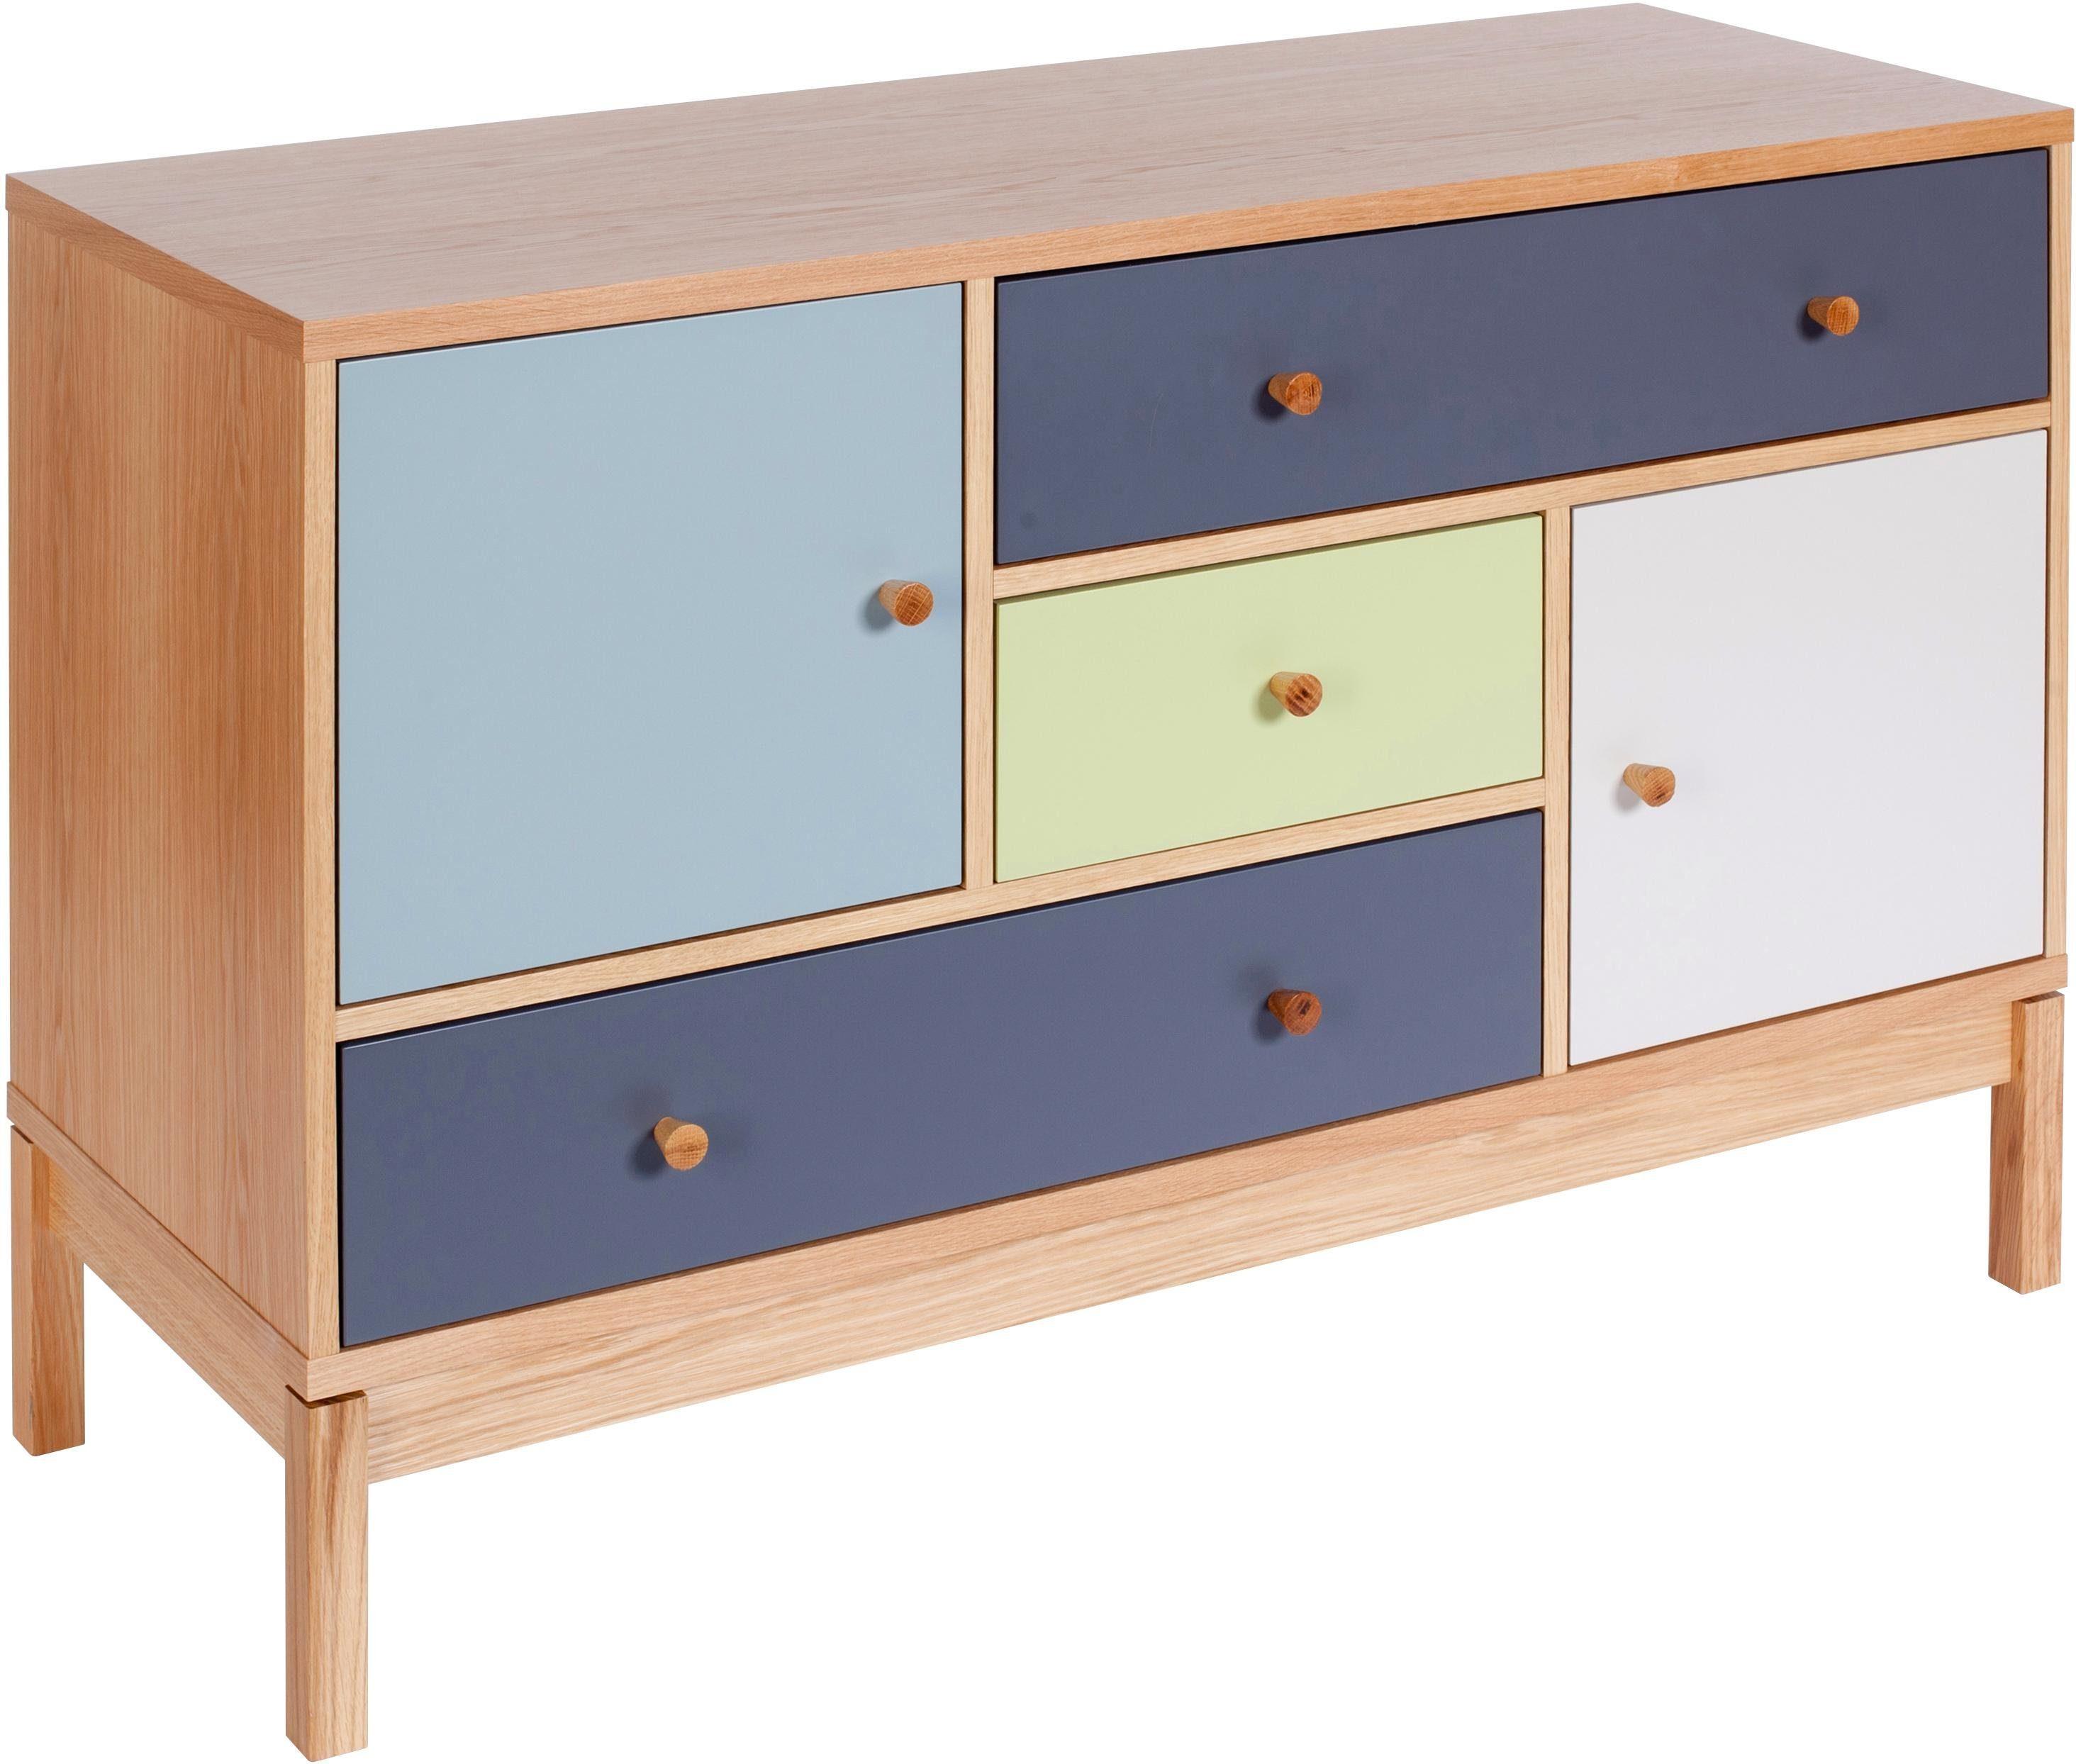 Woodman Sideboard »Bosse«, Breite 120 cm im skandinavian Design